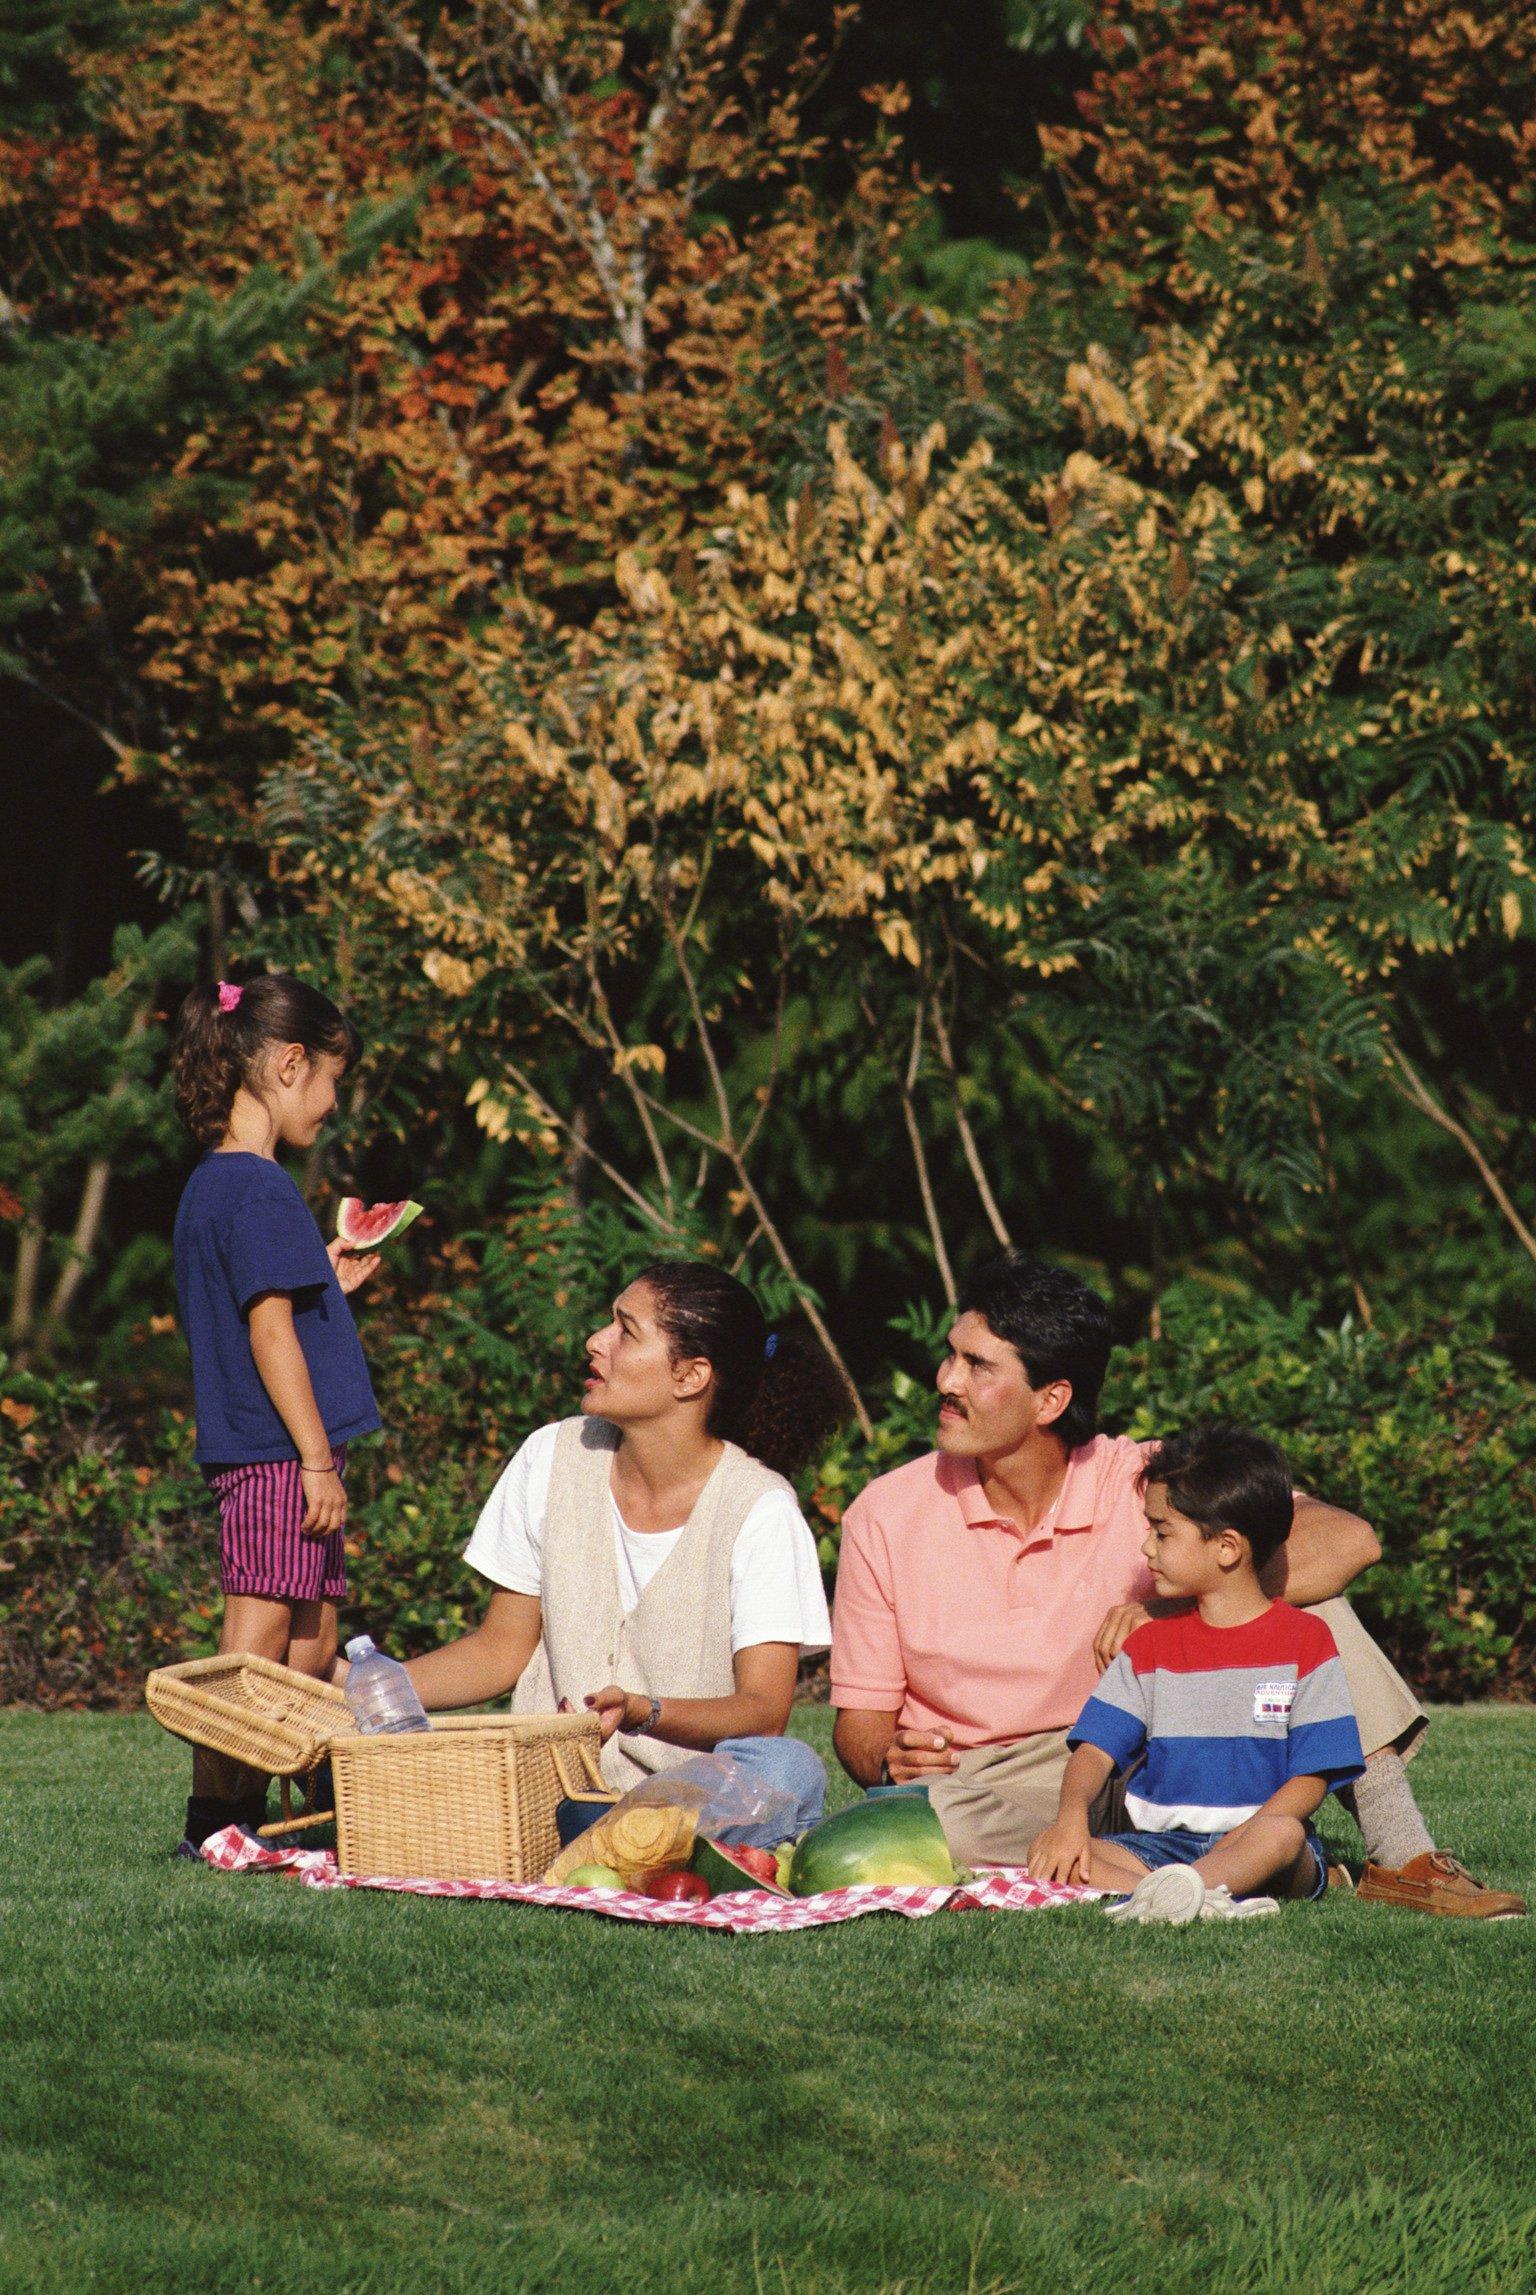 Estate Planning Strategies For Parents With Minor Children